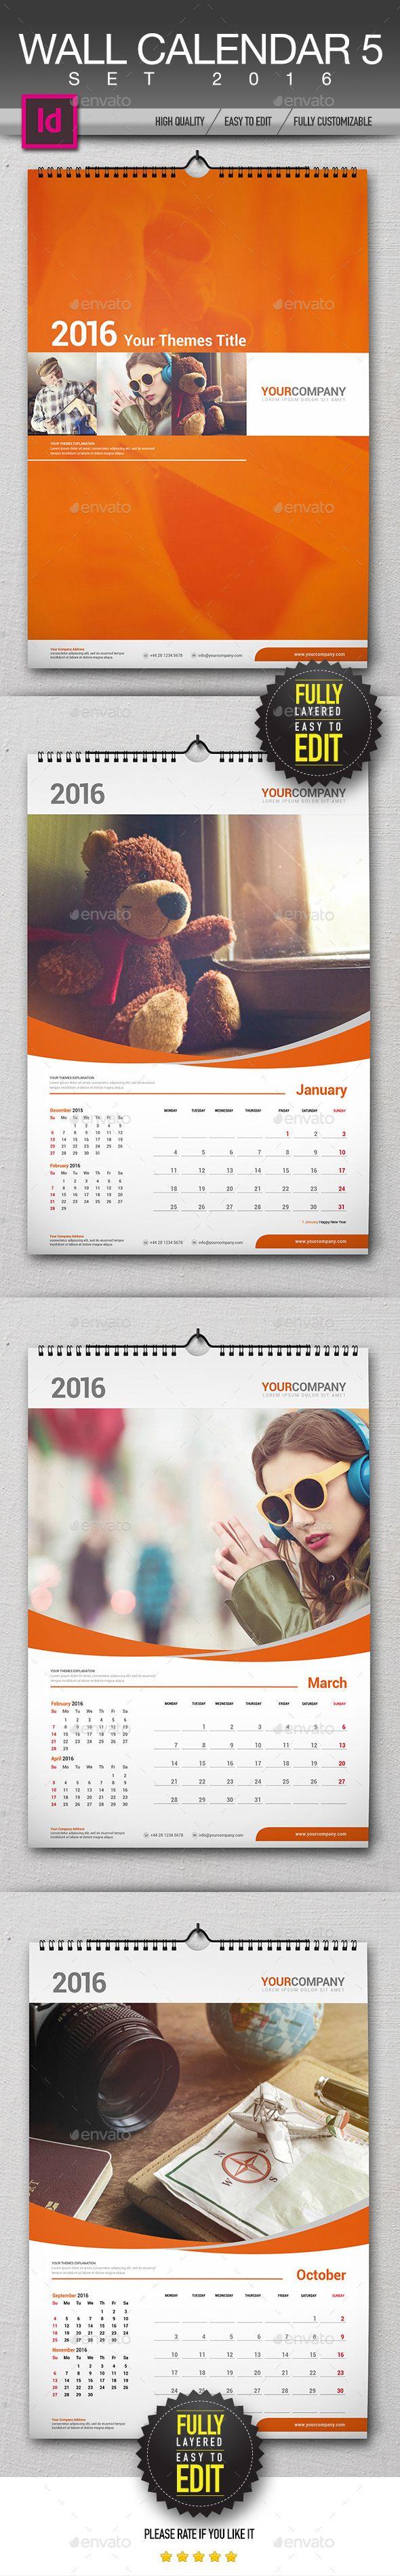 Wall Calendar 2016 Set Template InDesign INDD #design Download: http://graphicriver.net/item/wall-calendar-2016-set/13495864?ref=ksioks